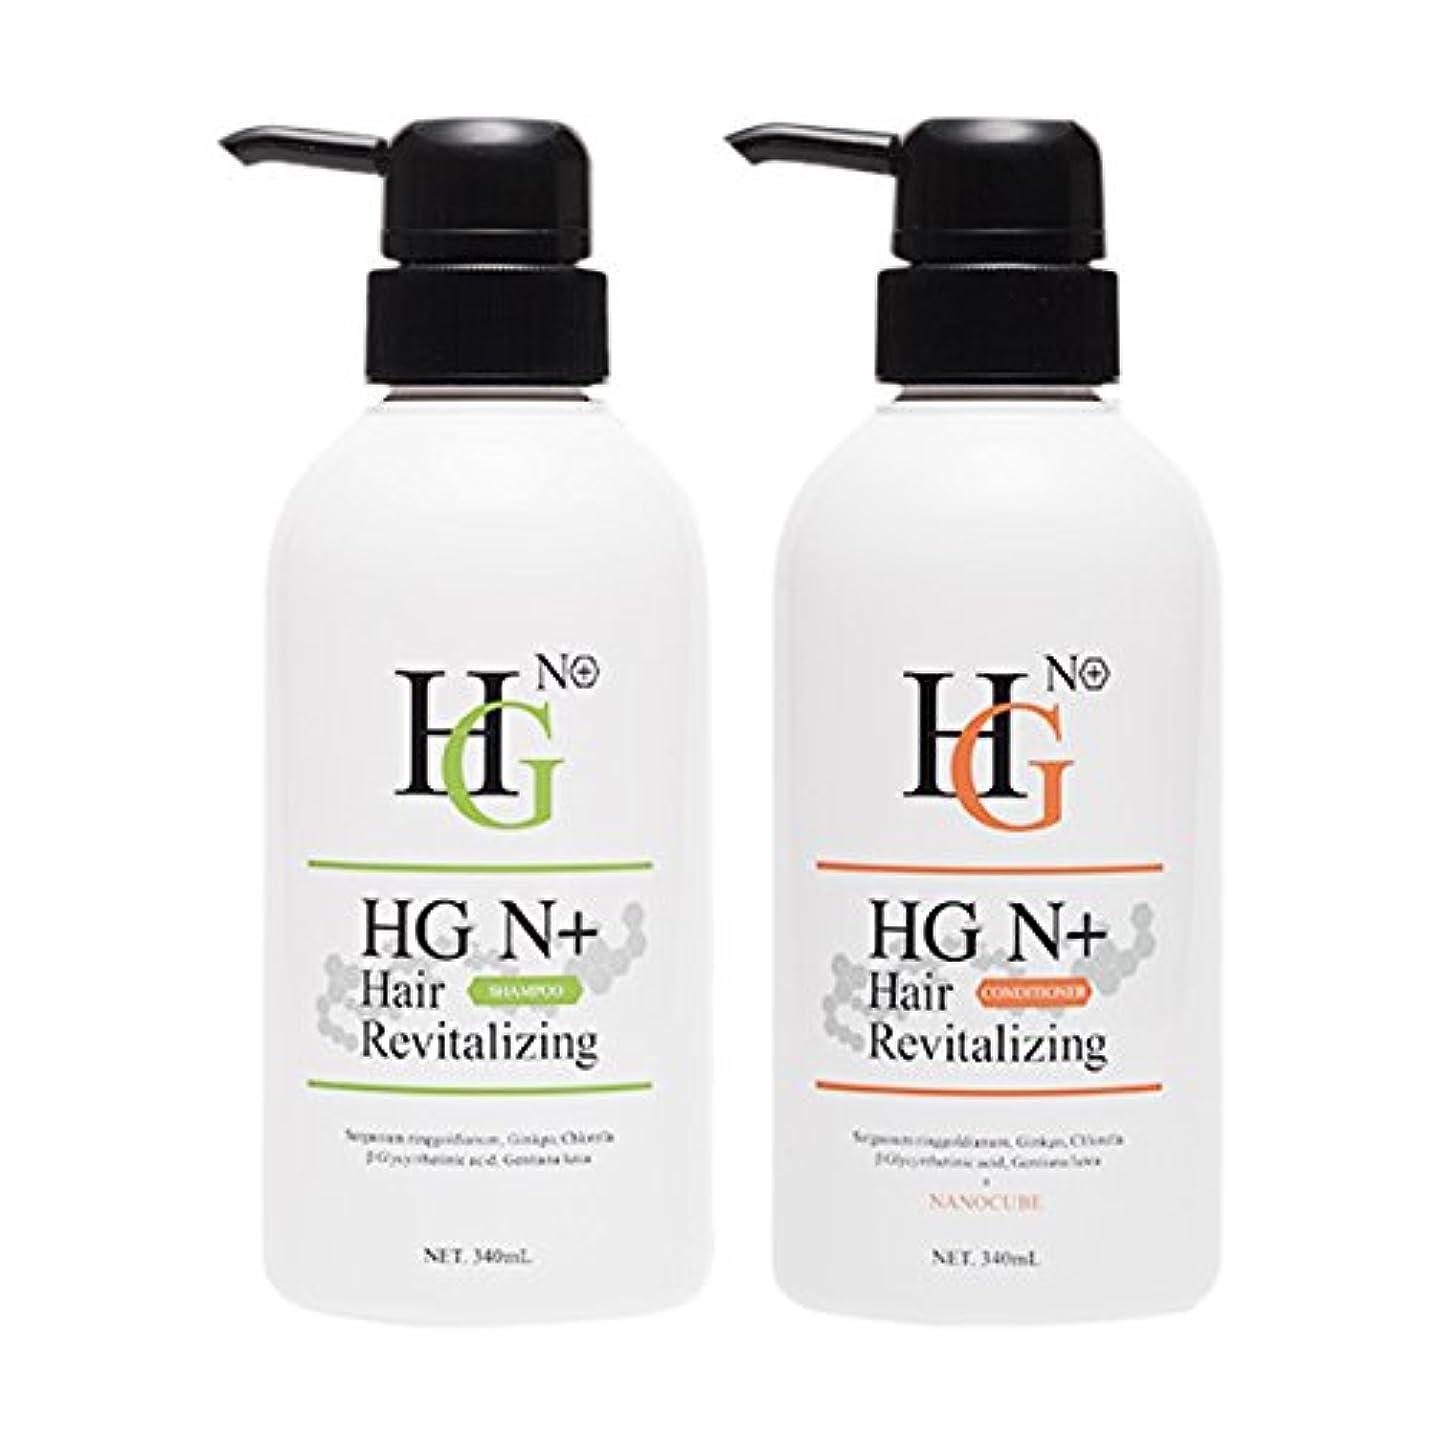 HG N+ シャンプー?コンディショナー 2点セット 薬用ドクターズヘアケアシリーズ 医療機関専売品